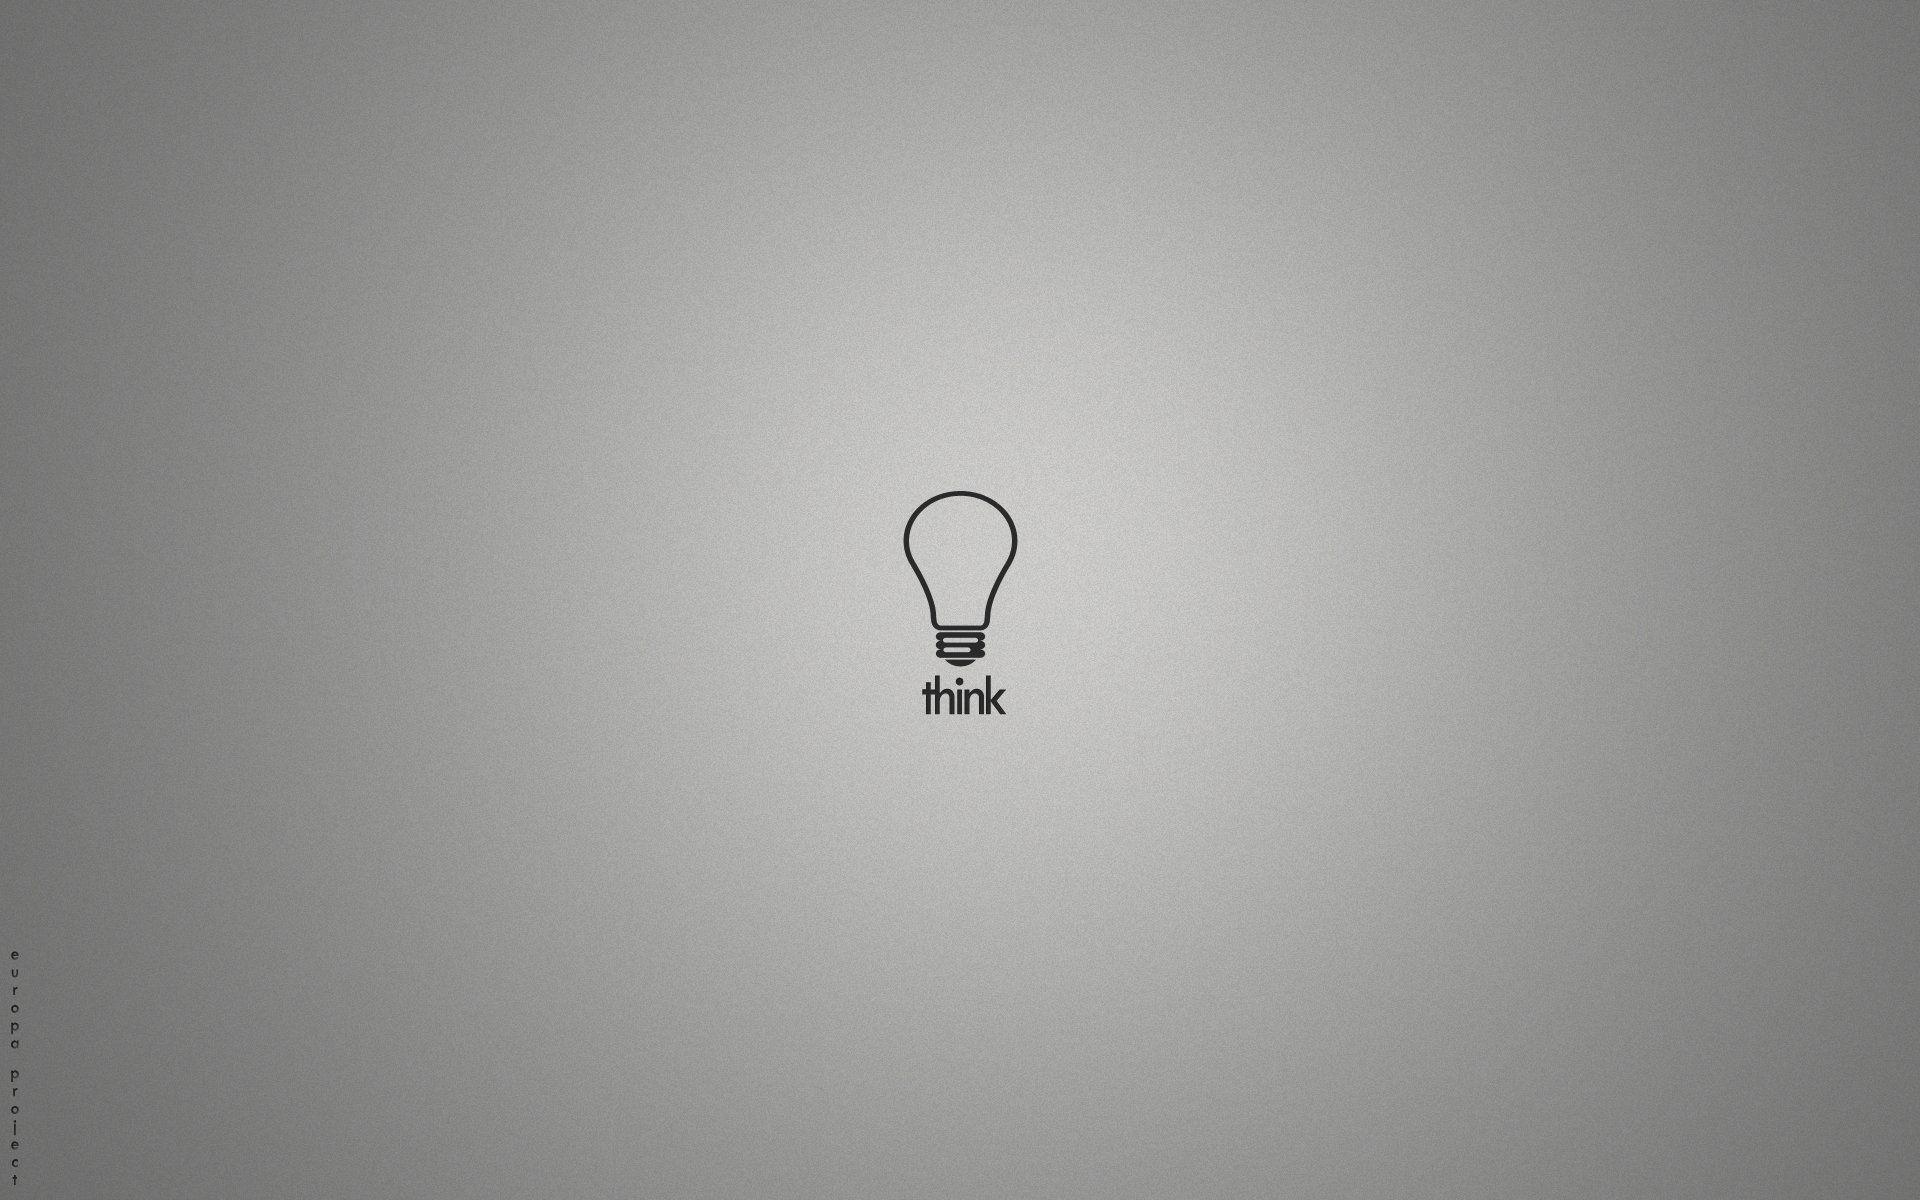 Light Minimalist Wallpapers - Top Free Light Minimalist ...